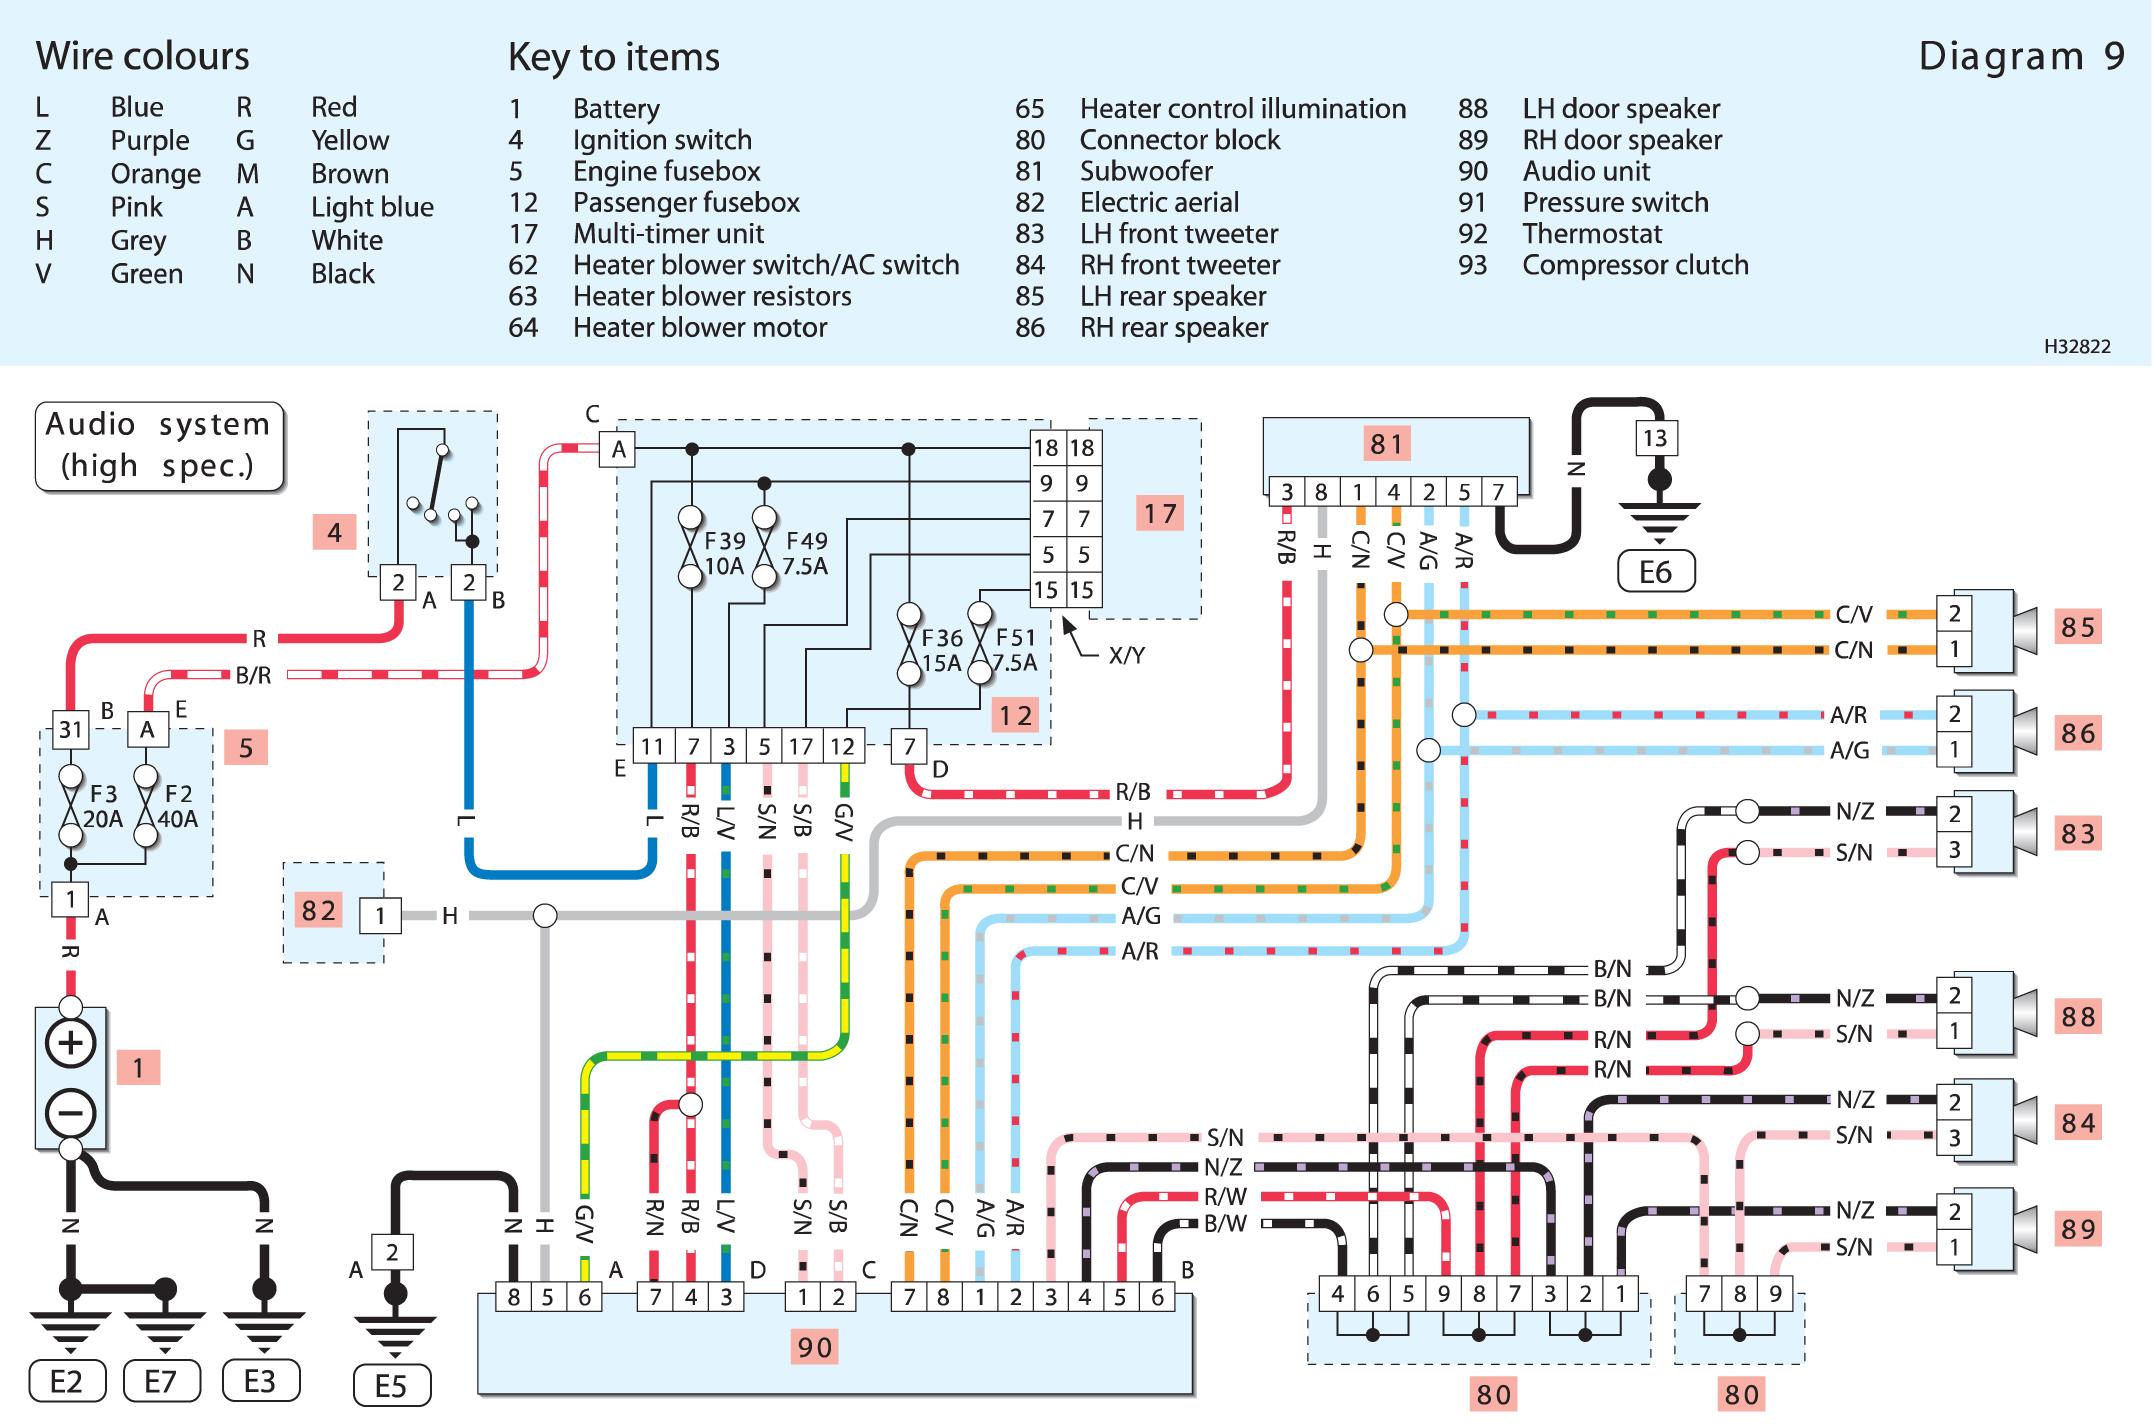 peugeot boxer wiring problems house wiring diagram symbols u2022 rh mollusksurfshopnyc com peugeot boxer radio wiring diagram peugeot boxer wiring diagram download